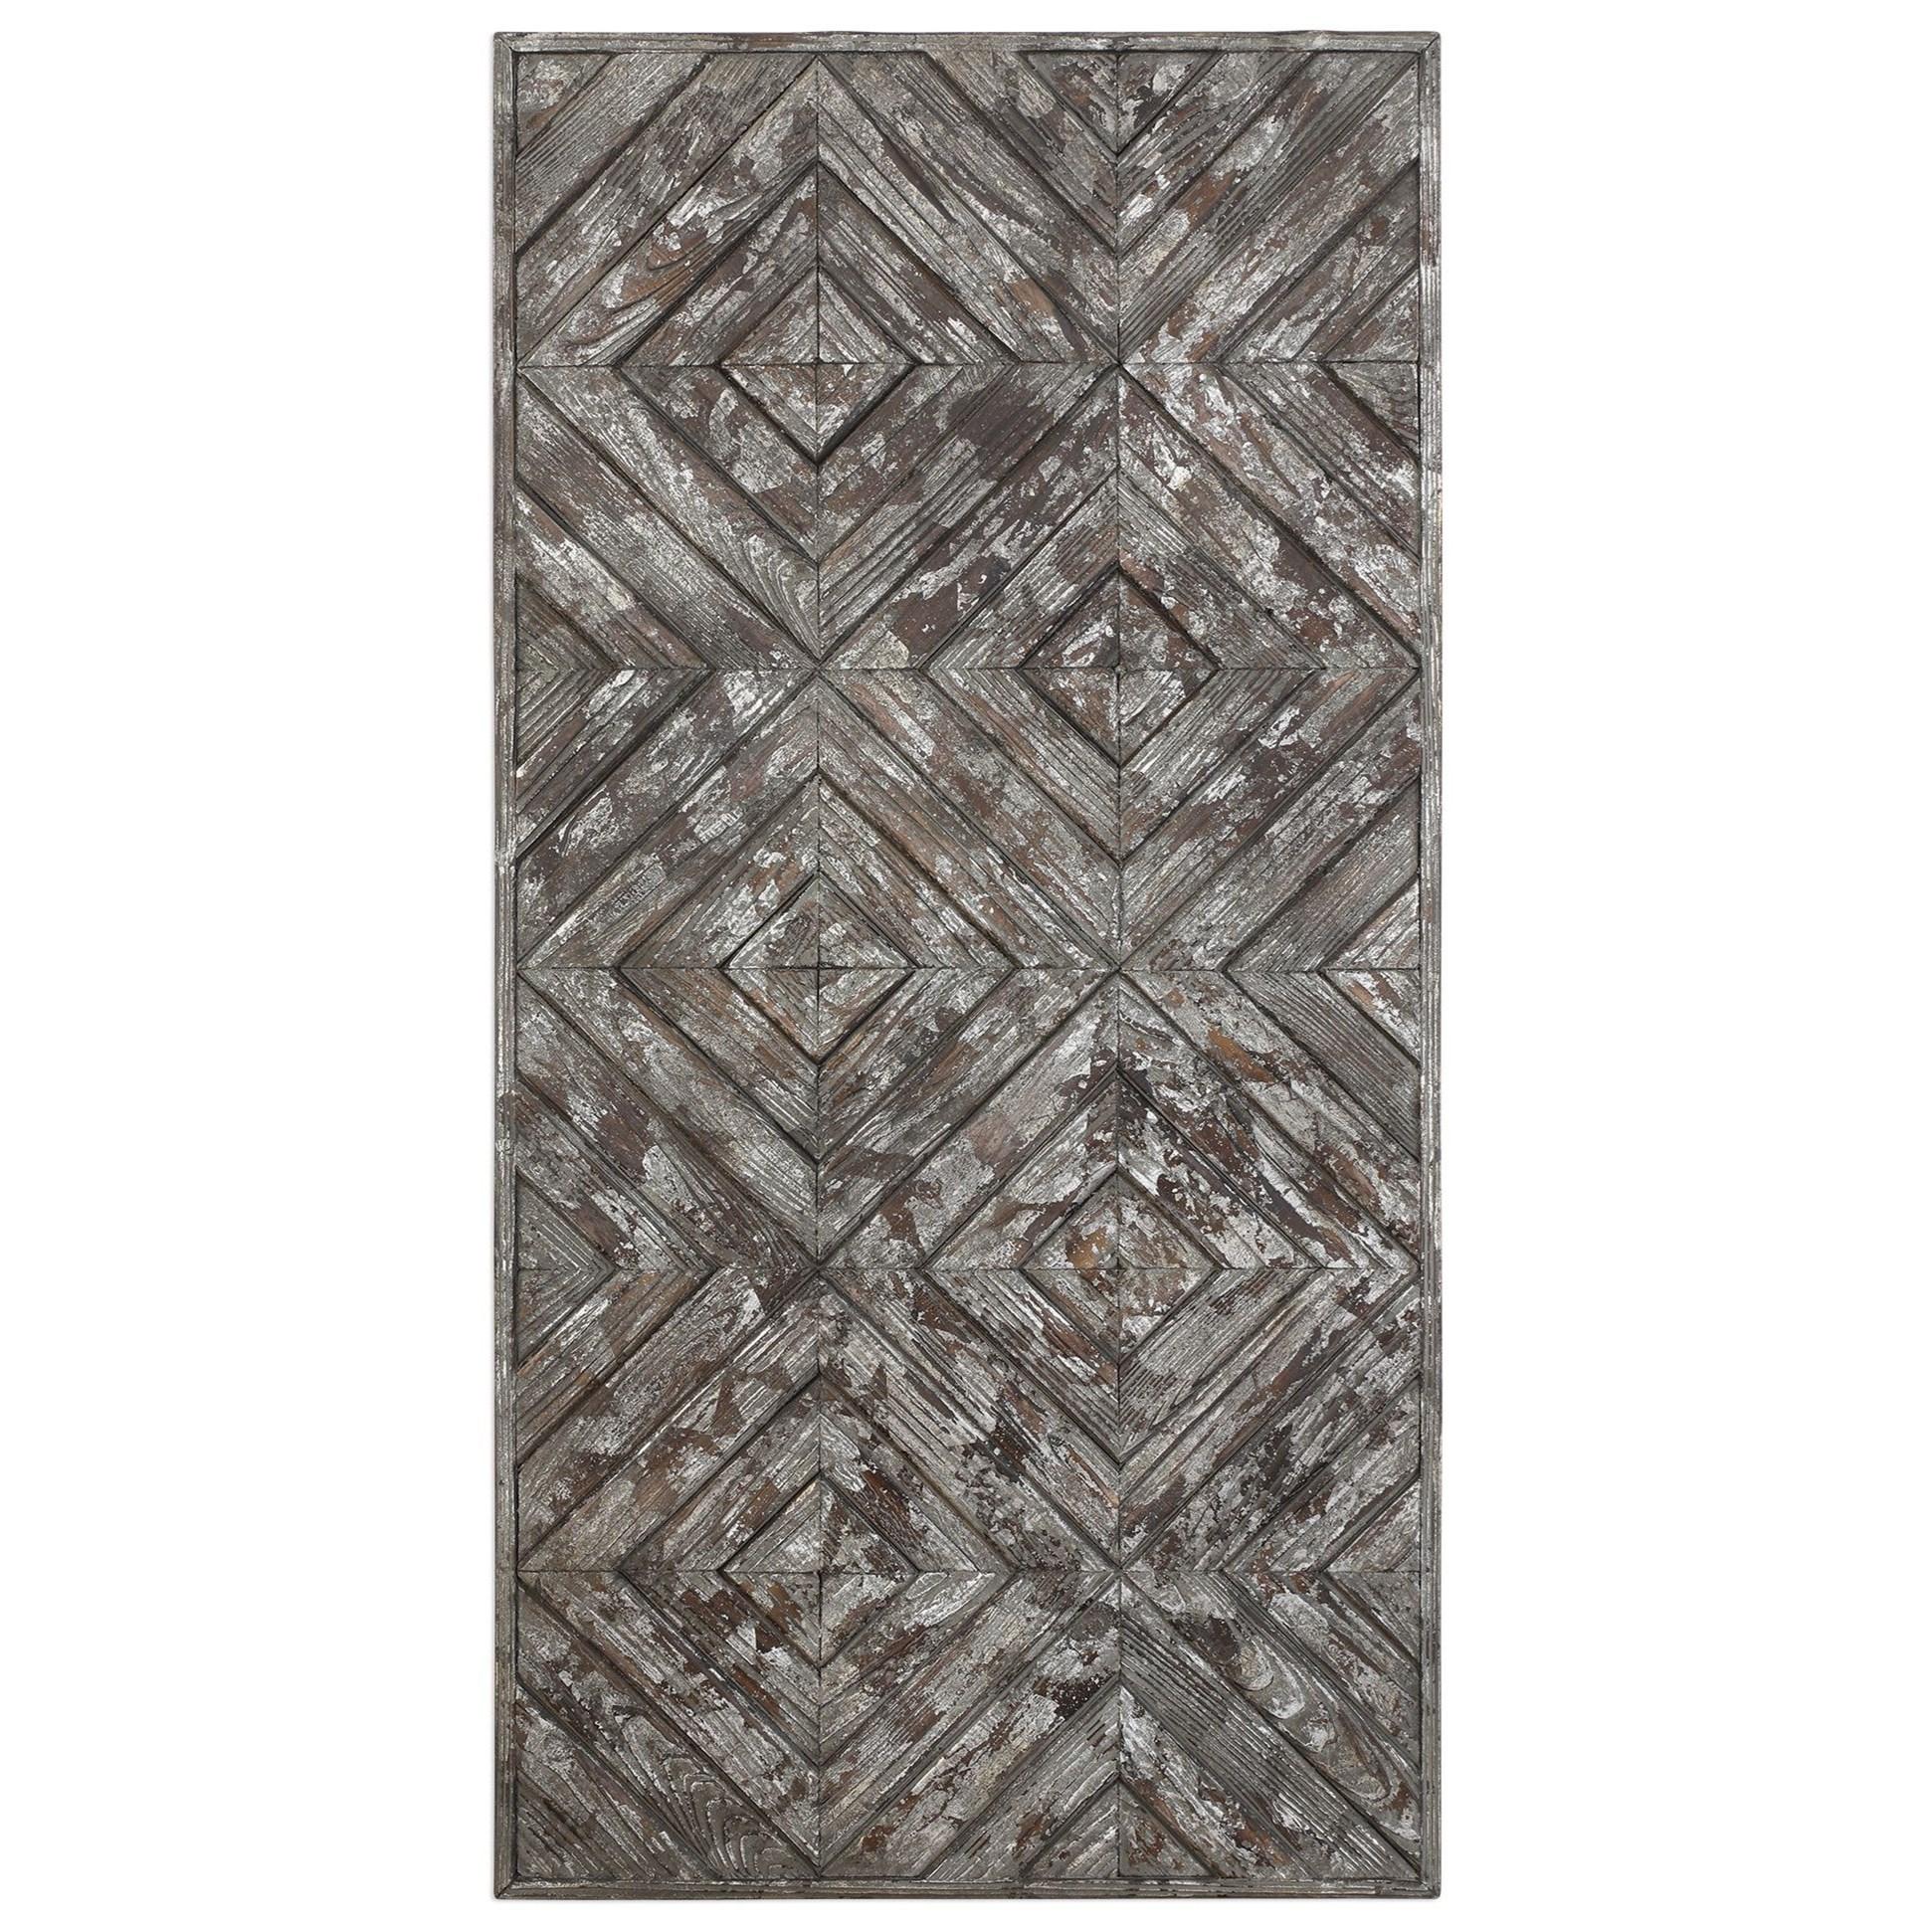 Roland Wood Panel